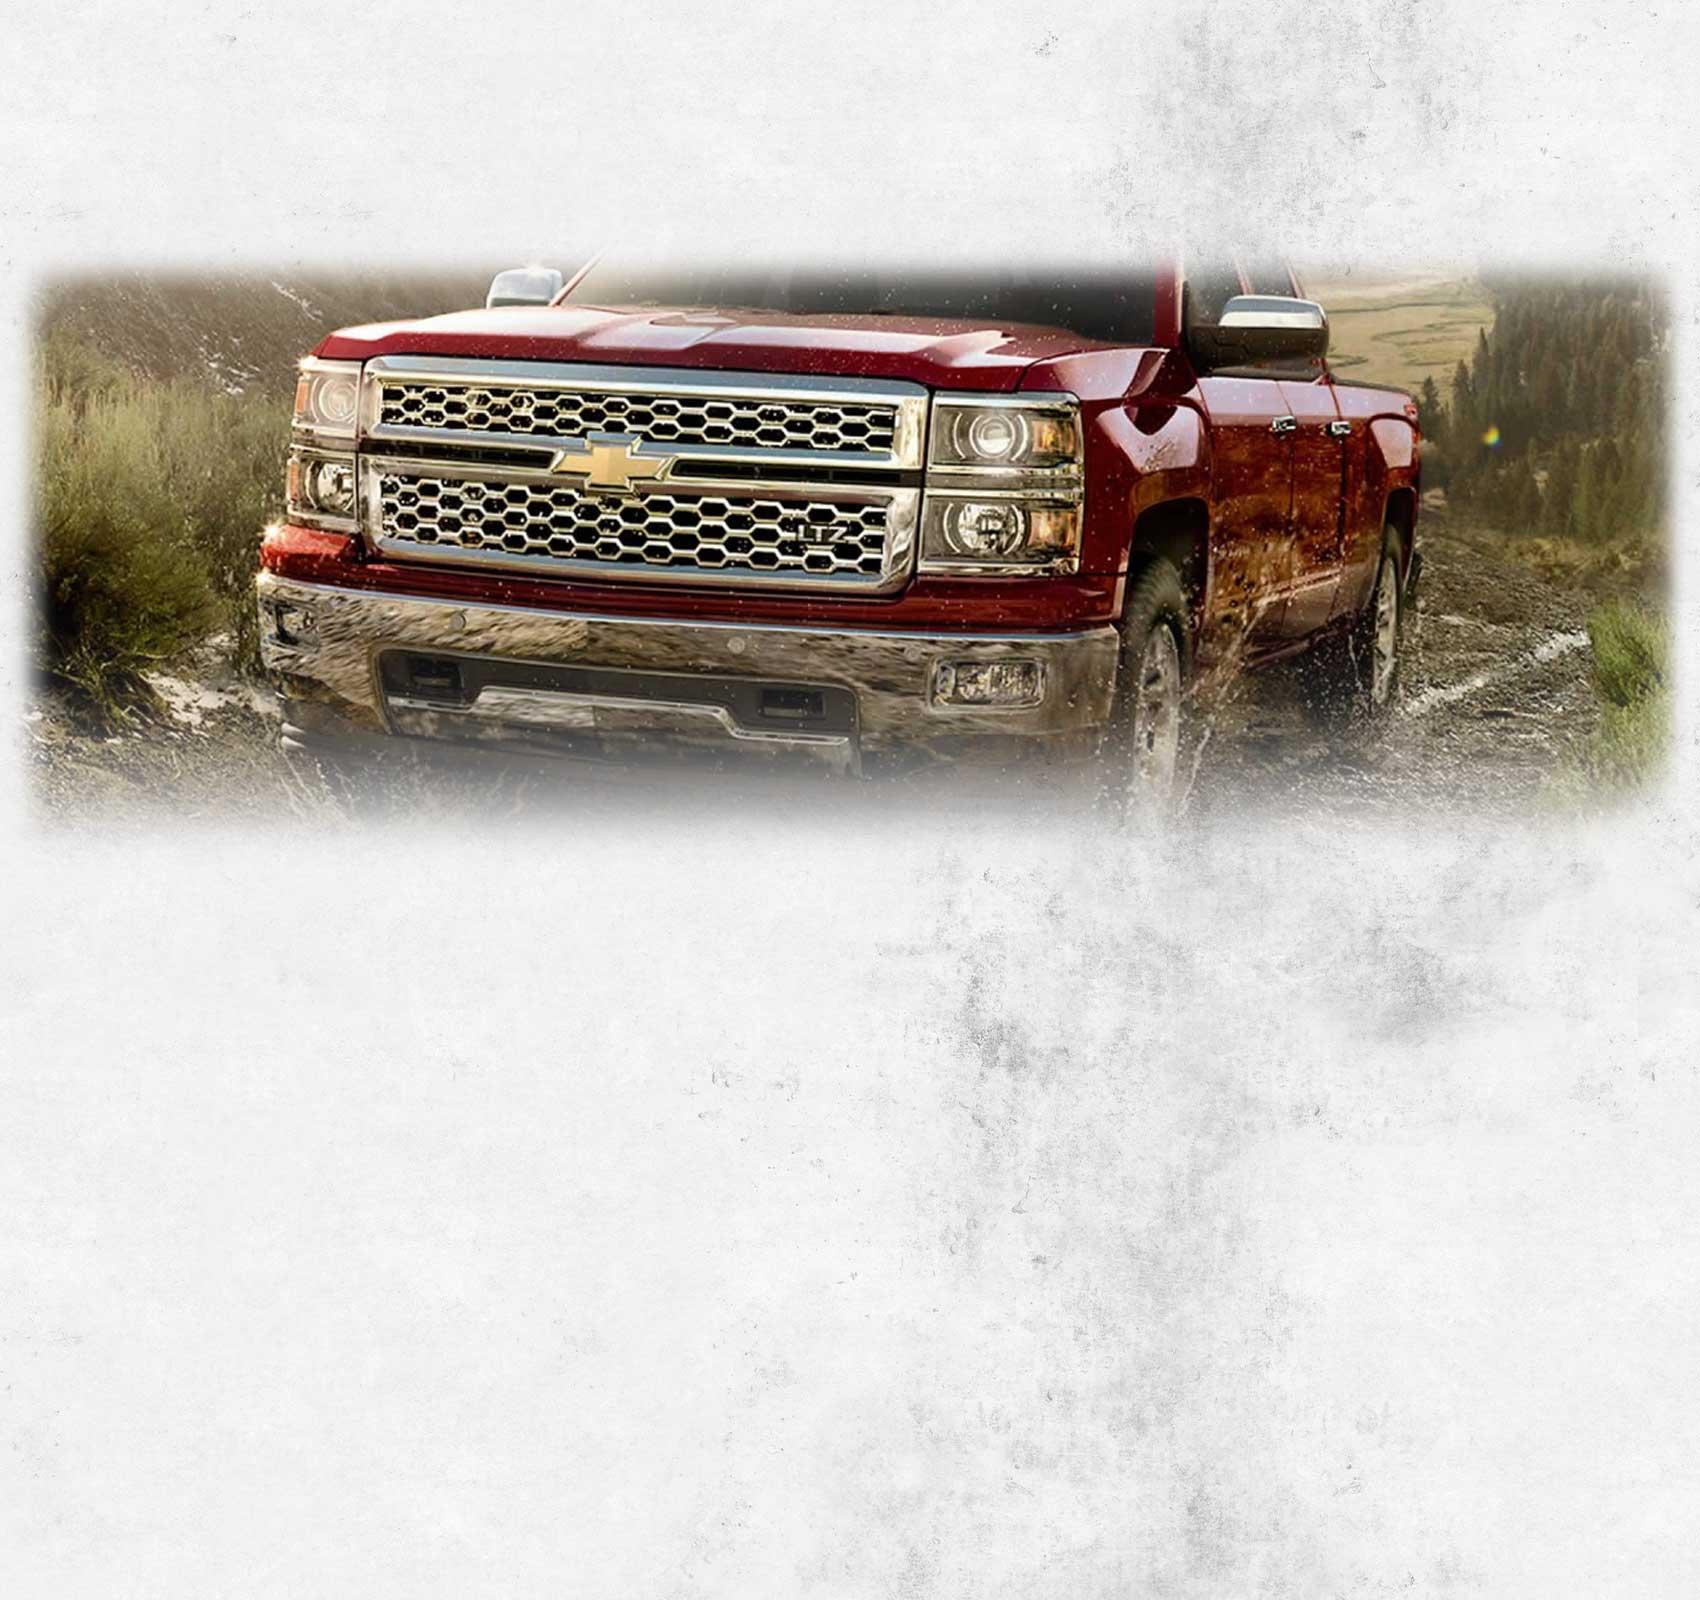 Chevy Isuzu Commercial Truck Dealer In Arizona - Chevrolet dealers phoenix area